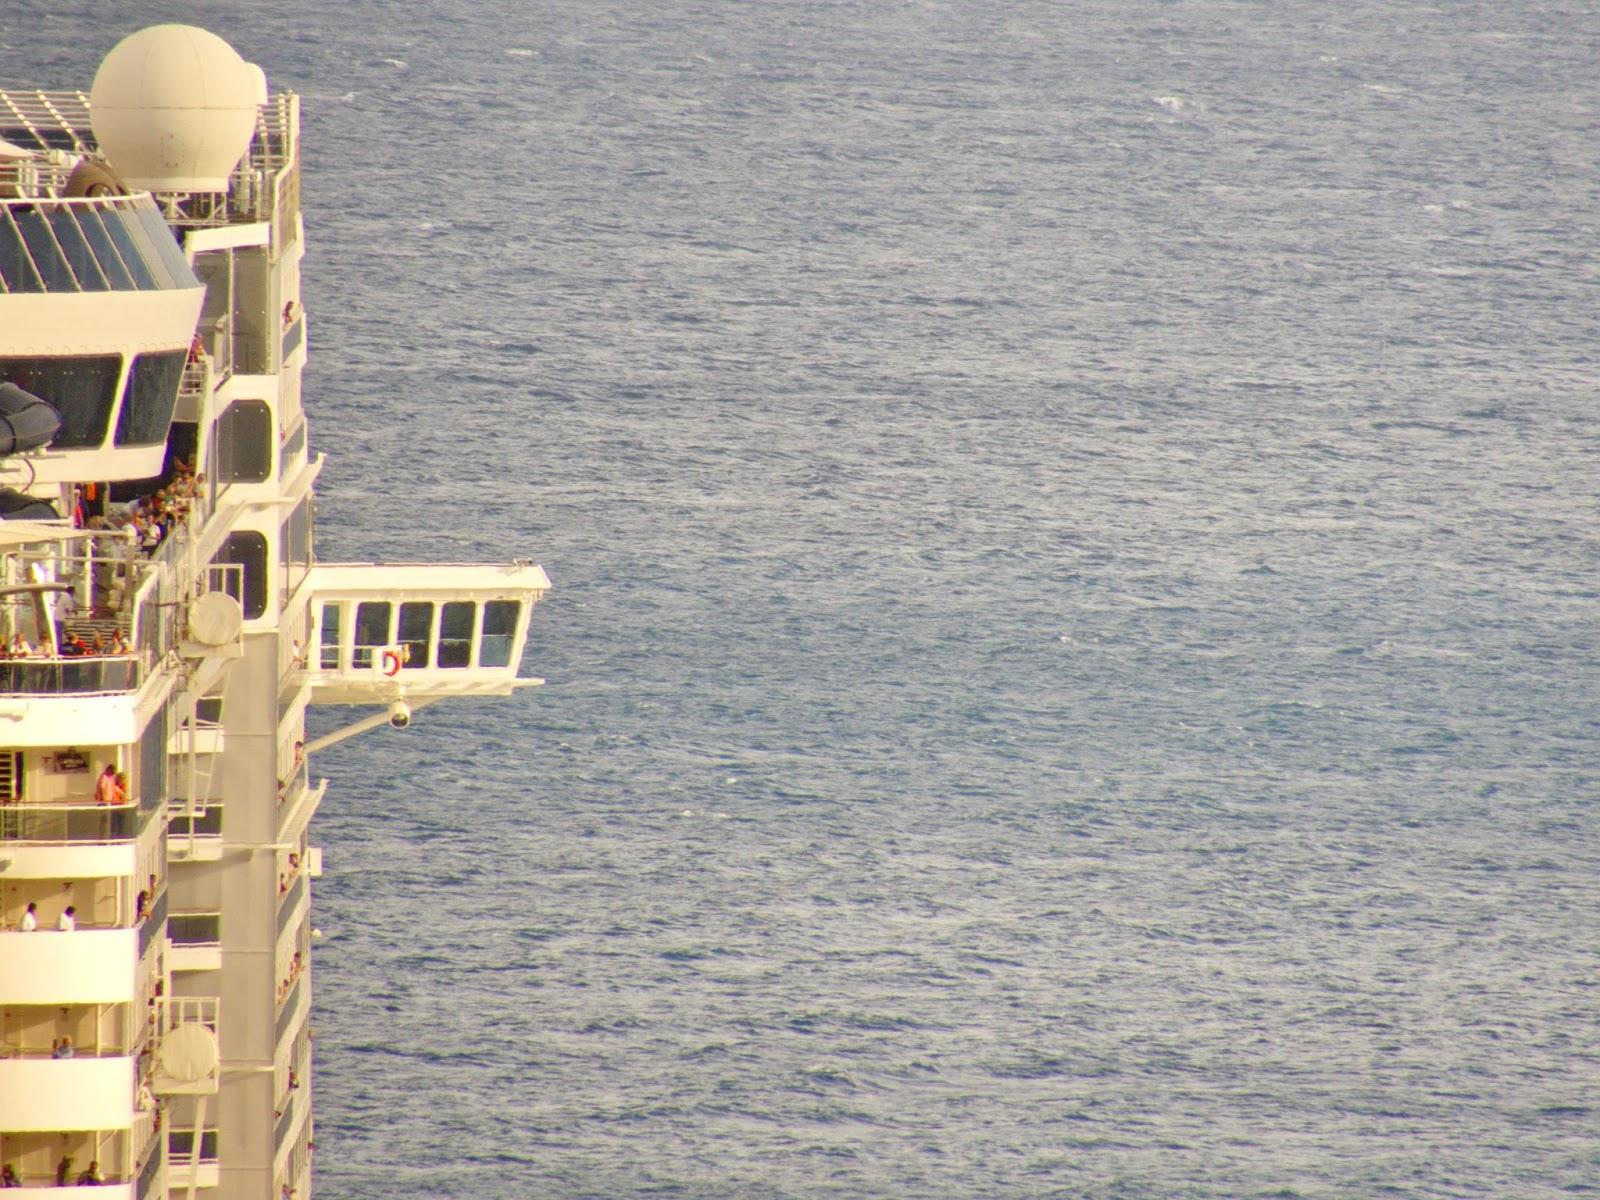 o navio e o imenso mar para navegar